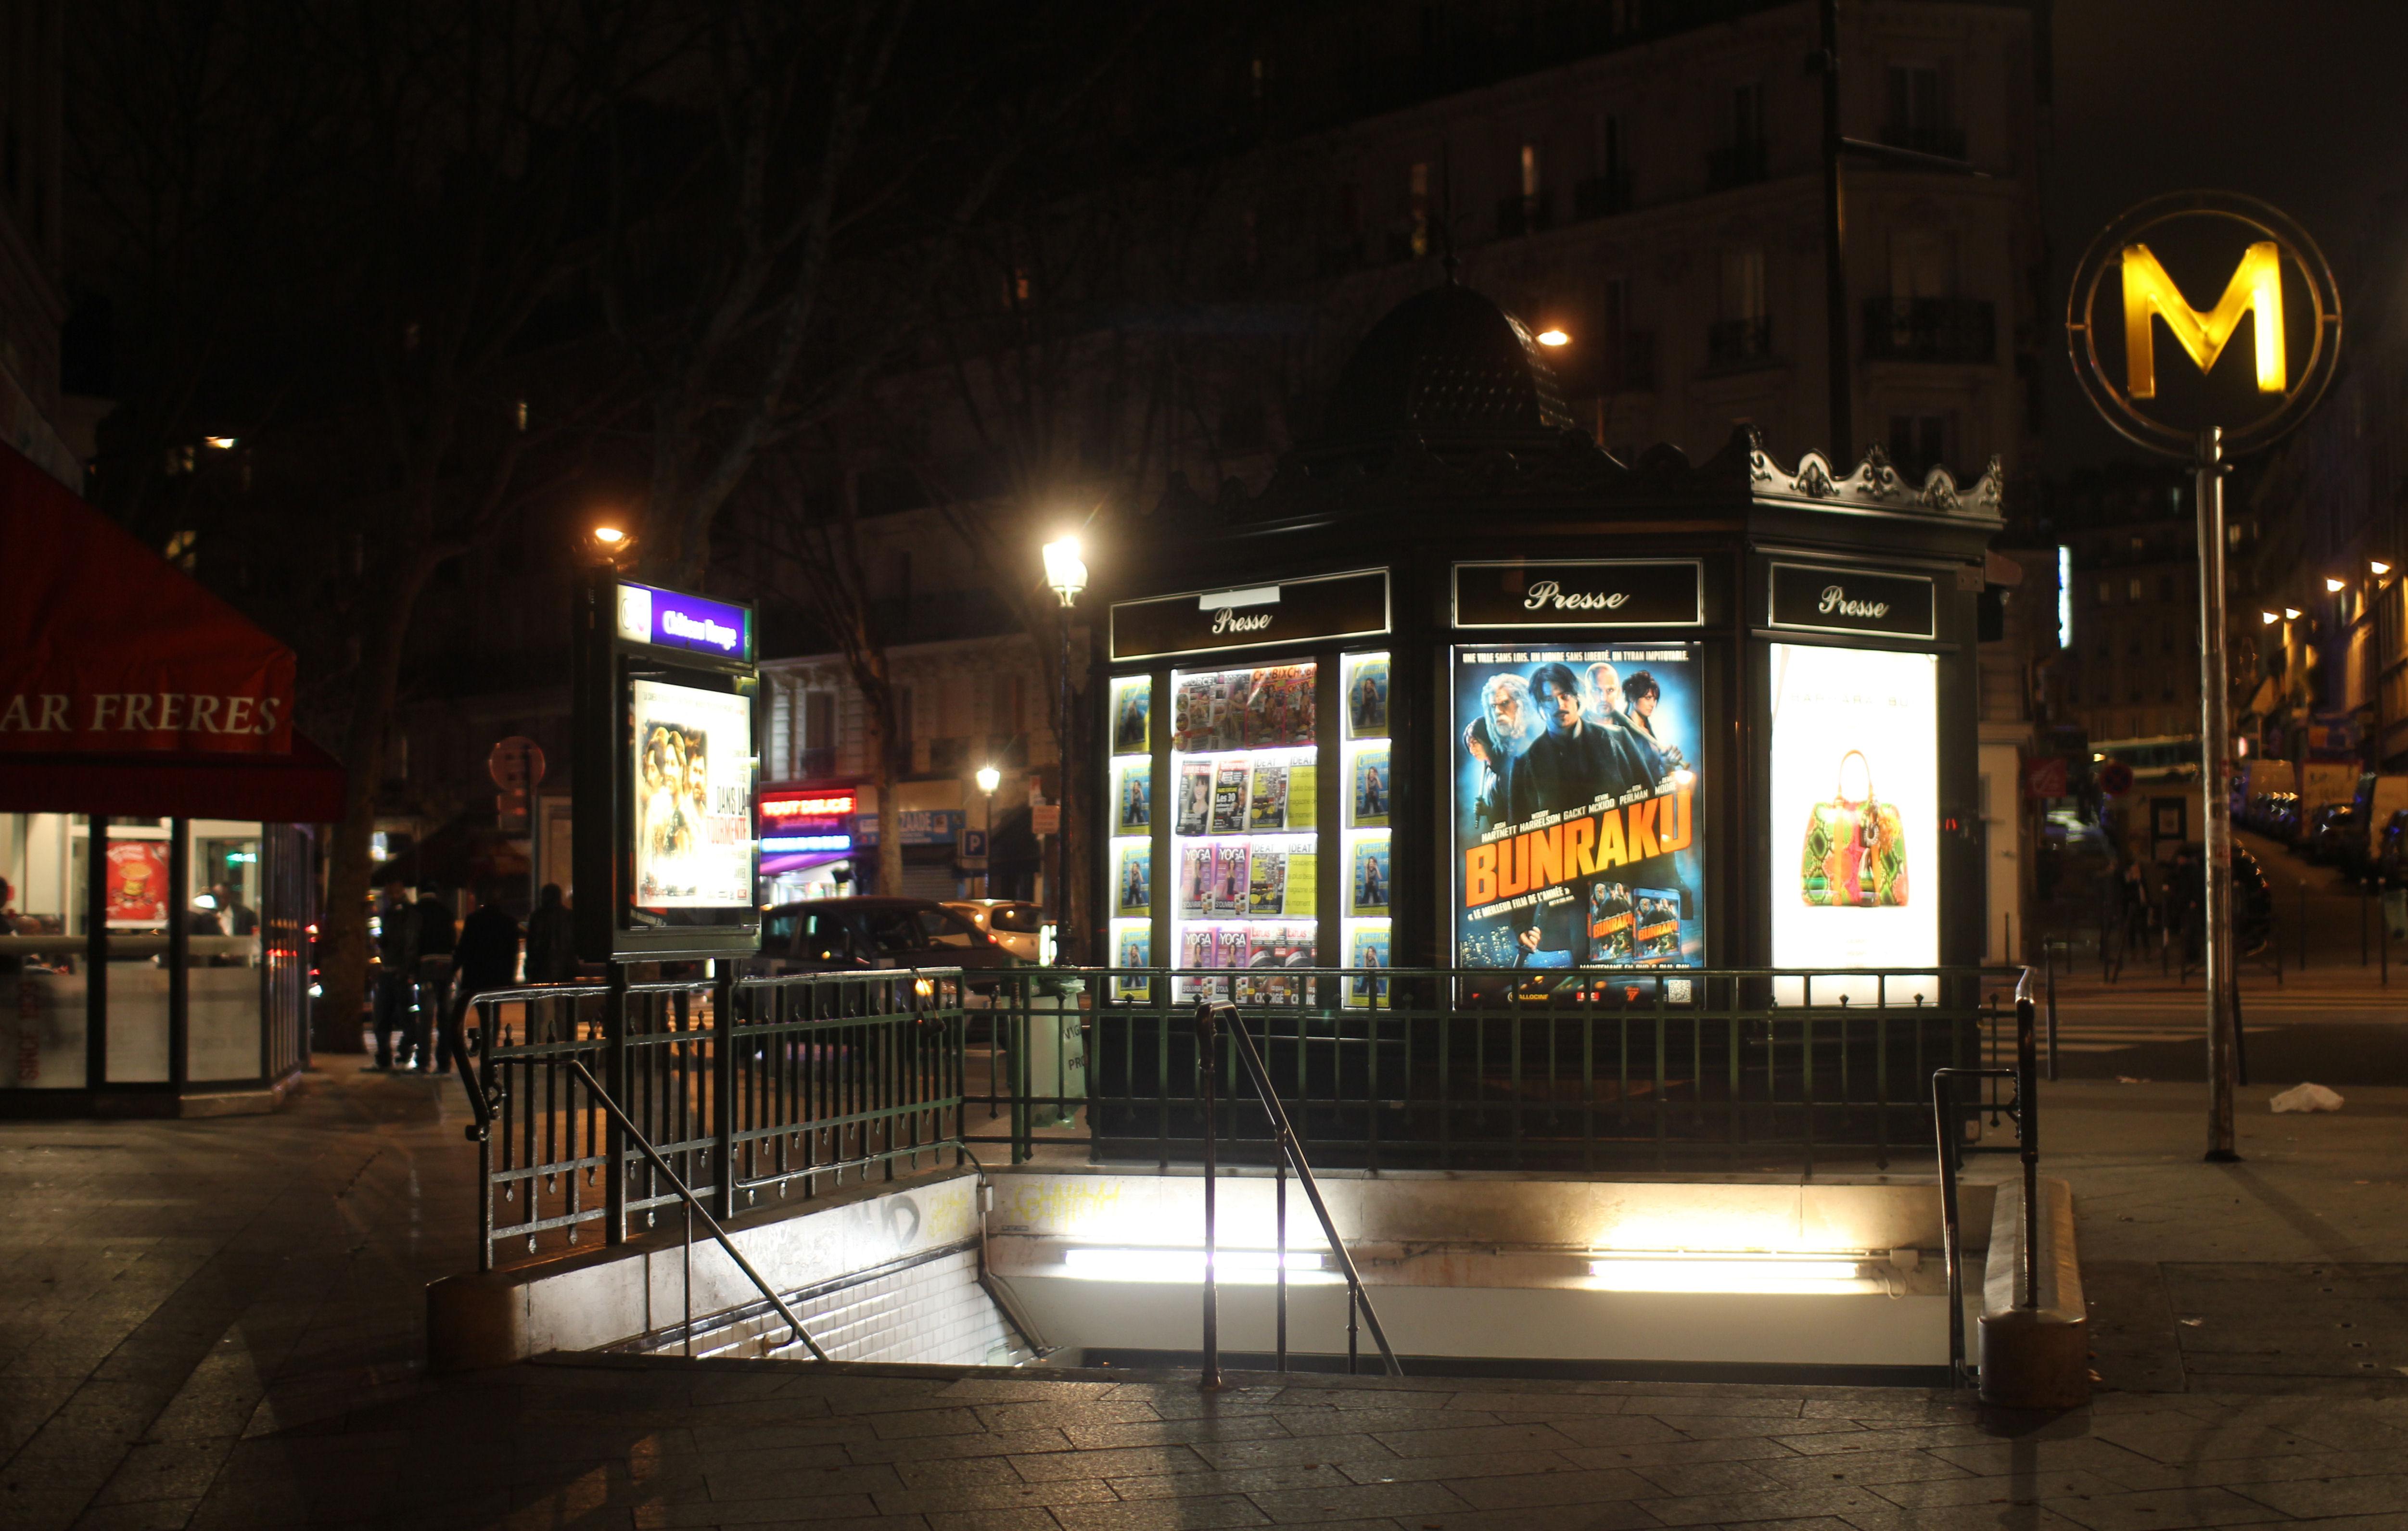 Château Rouge (stanice metra v Paříži)